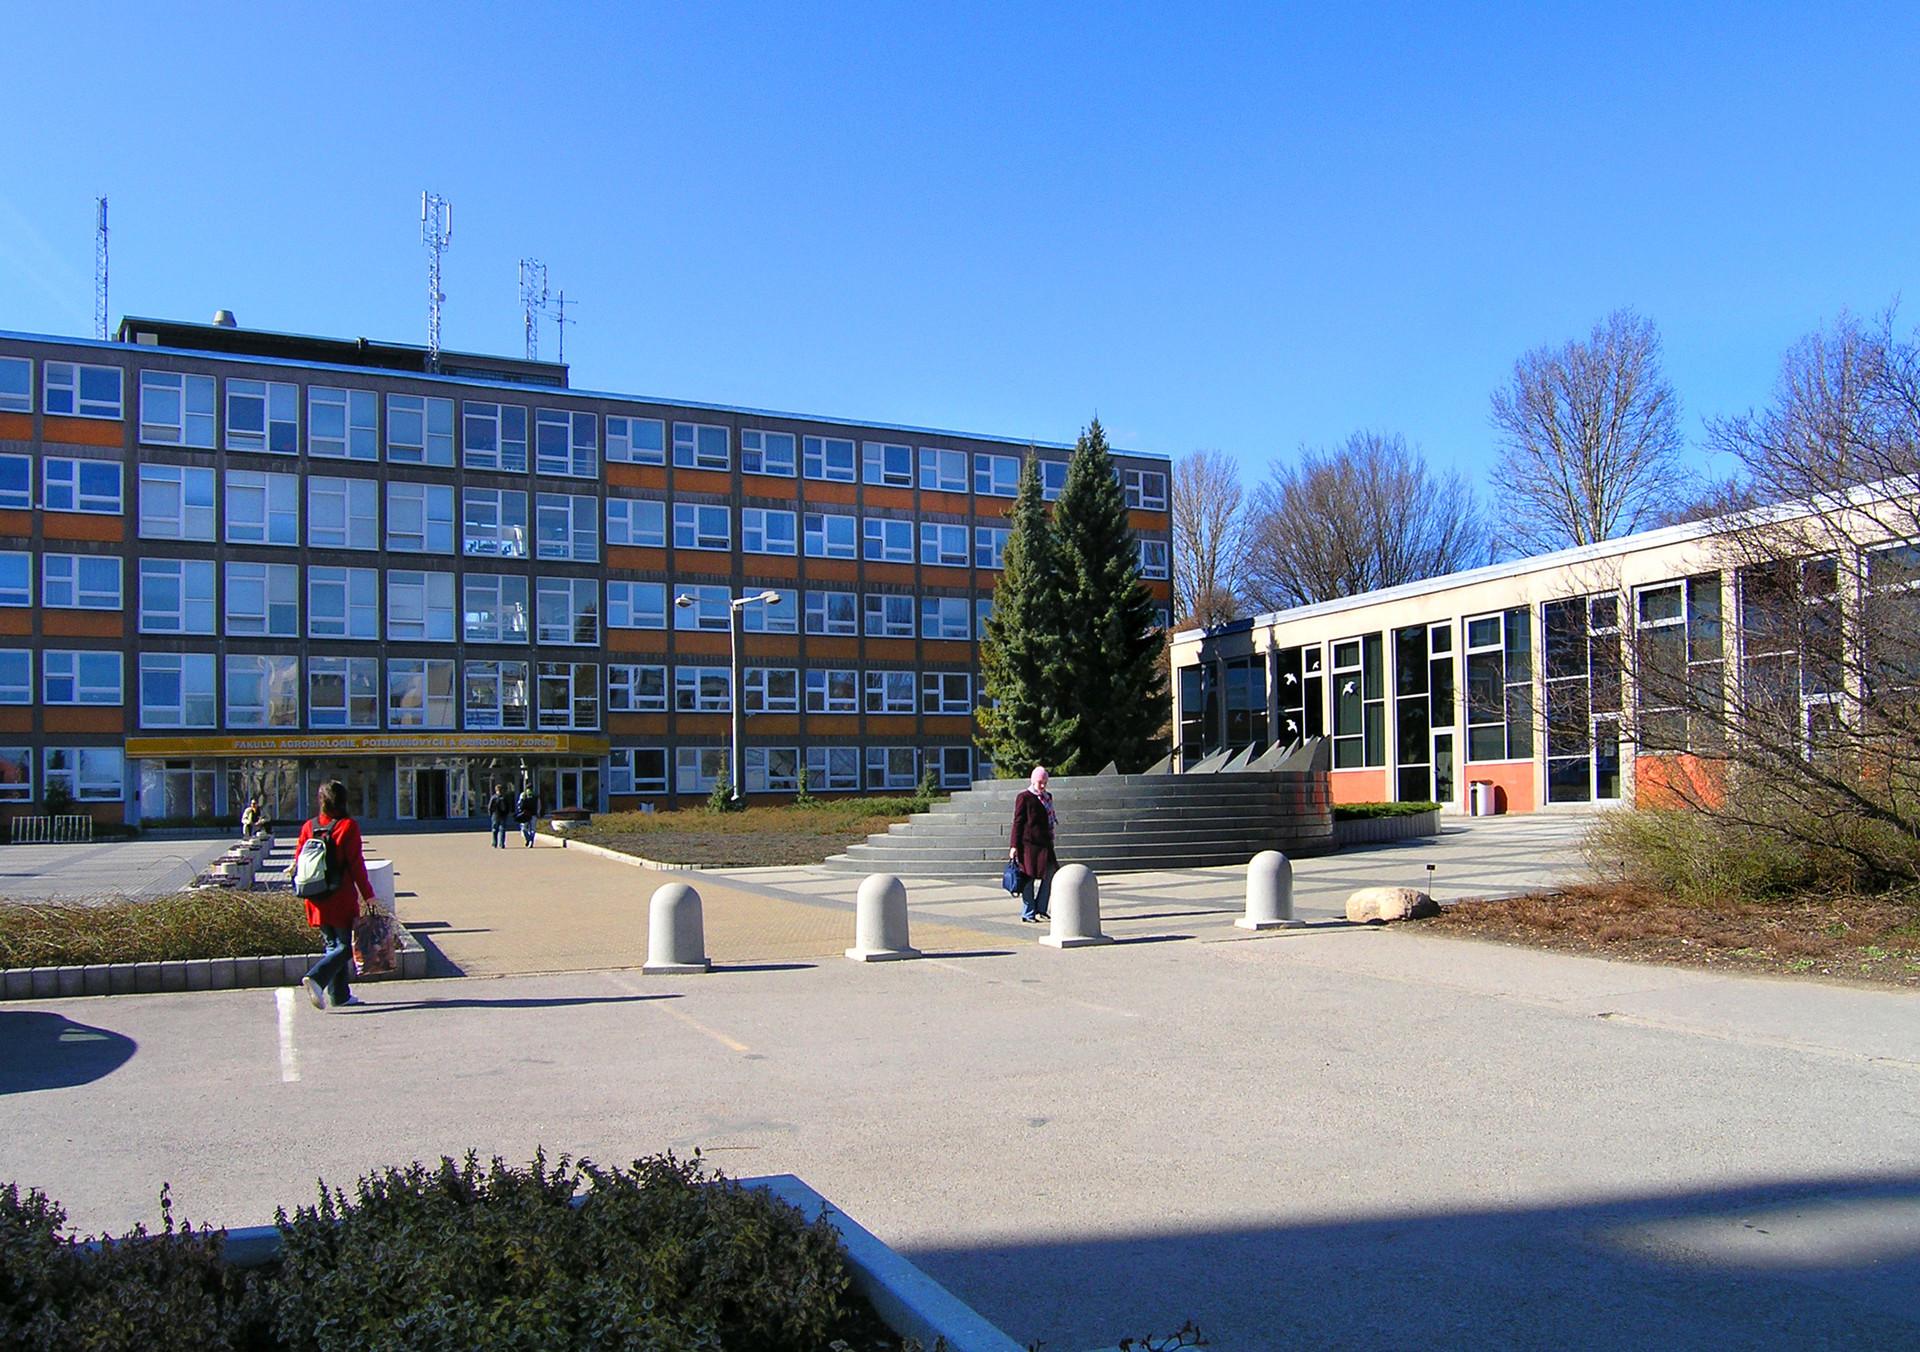 Doświadczenie na Česká zemědělská univerzita v Praze, Czechy według Simona